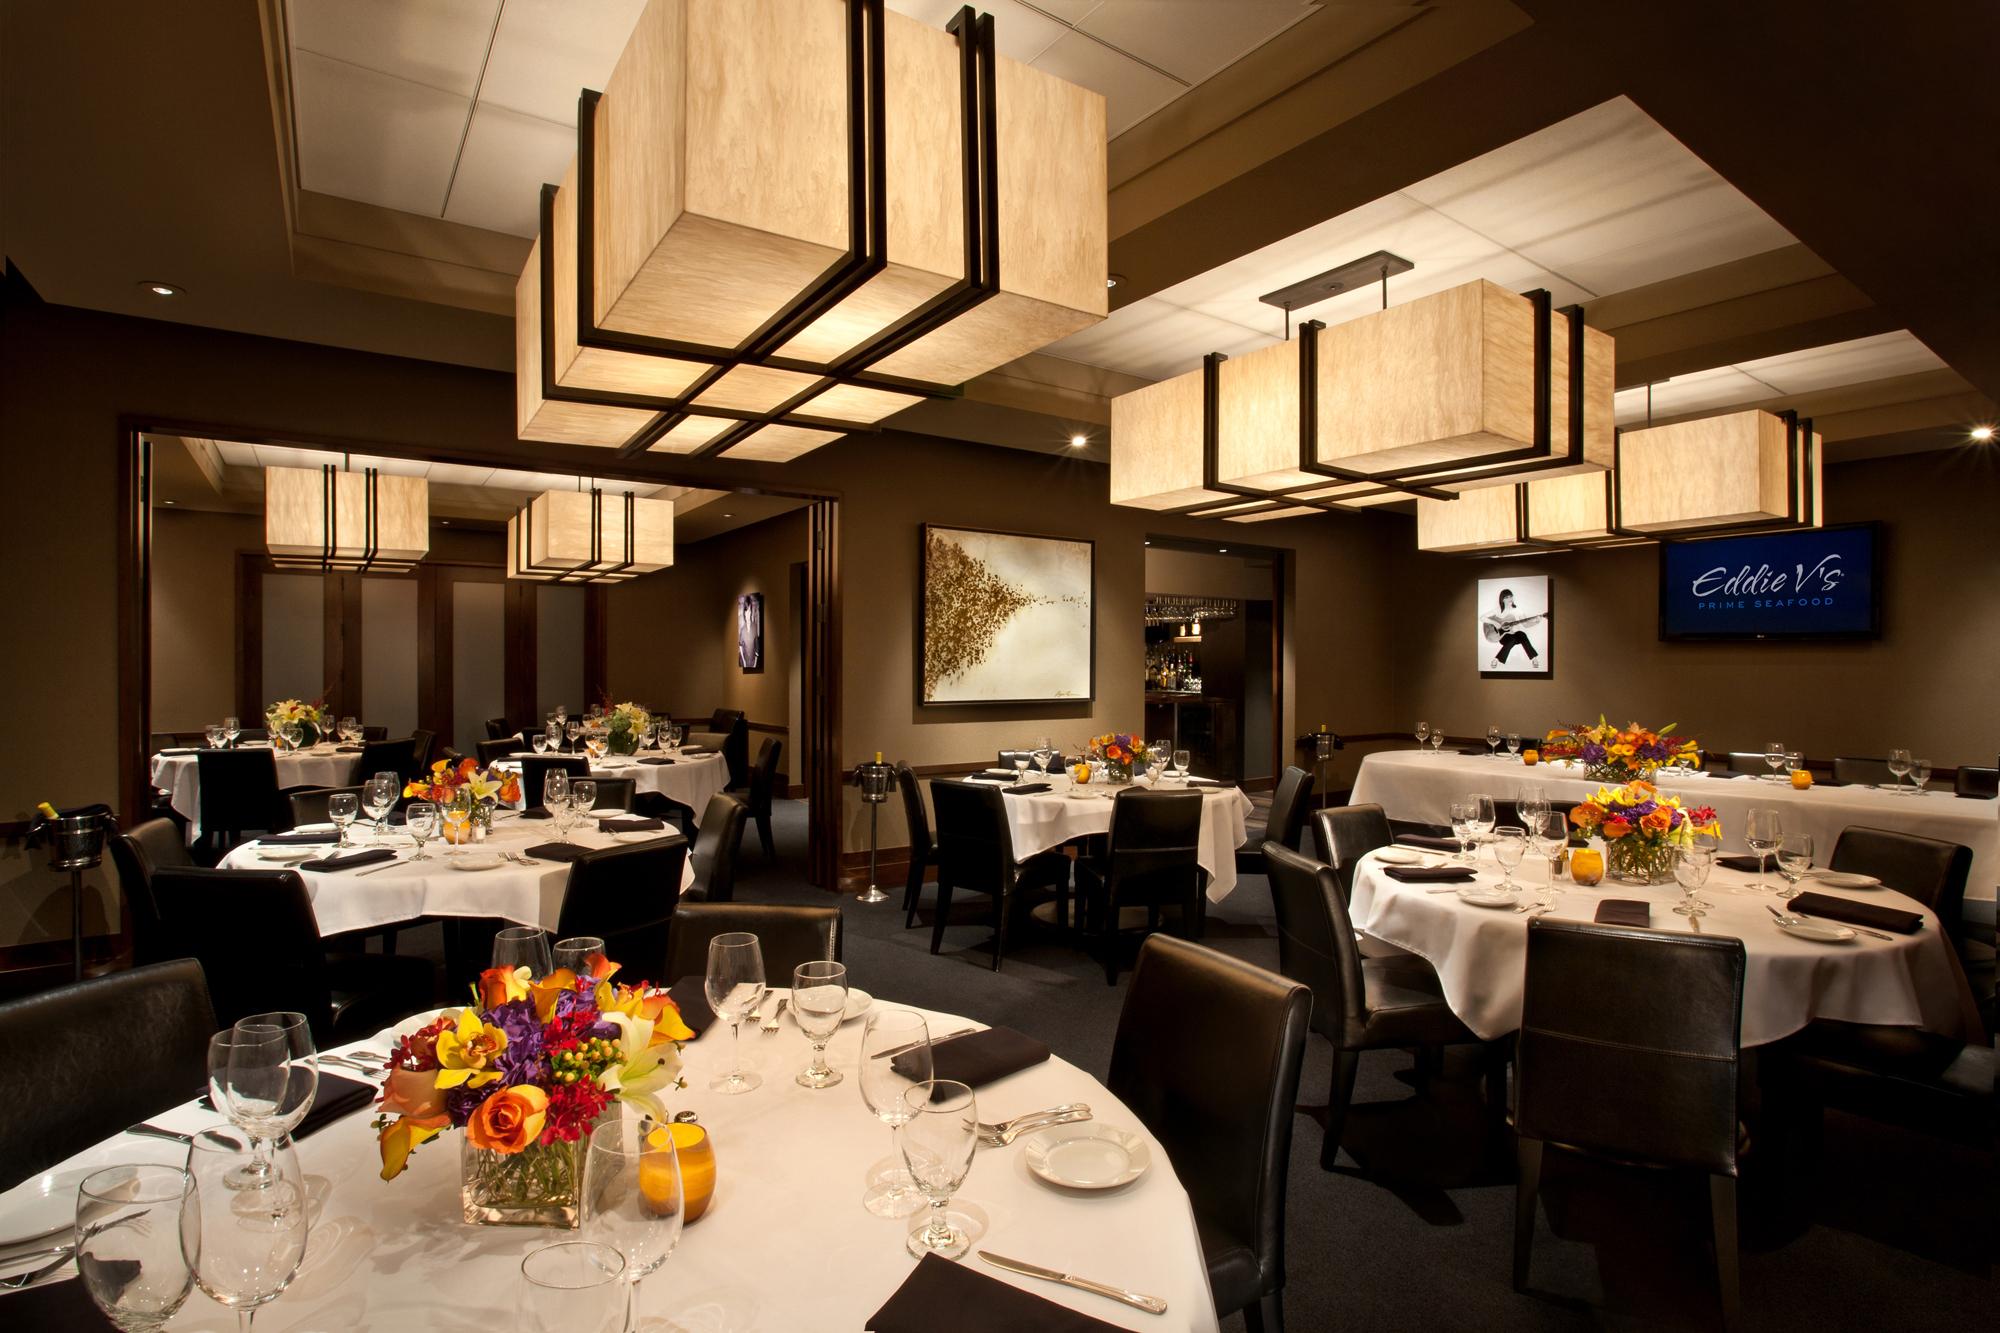 texas-restaurant-photographer-eddie-vs.jpg